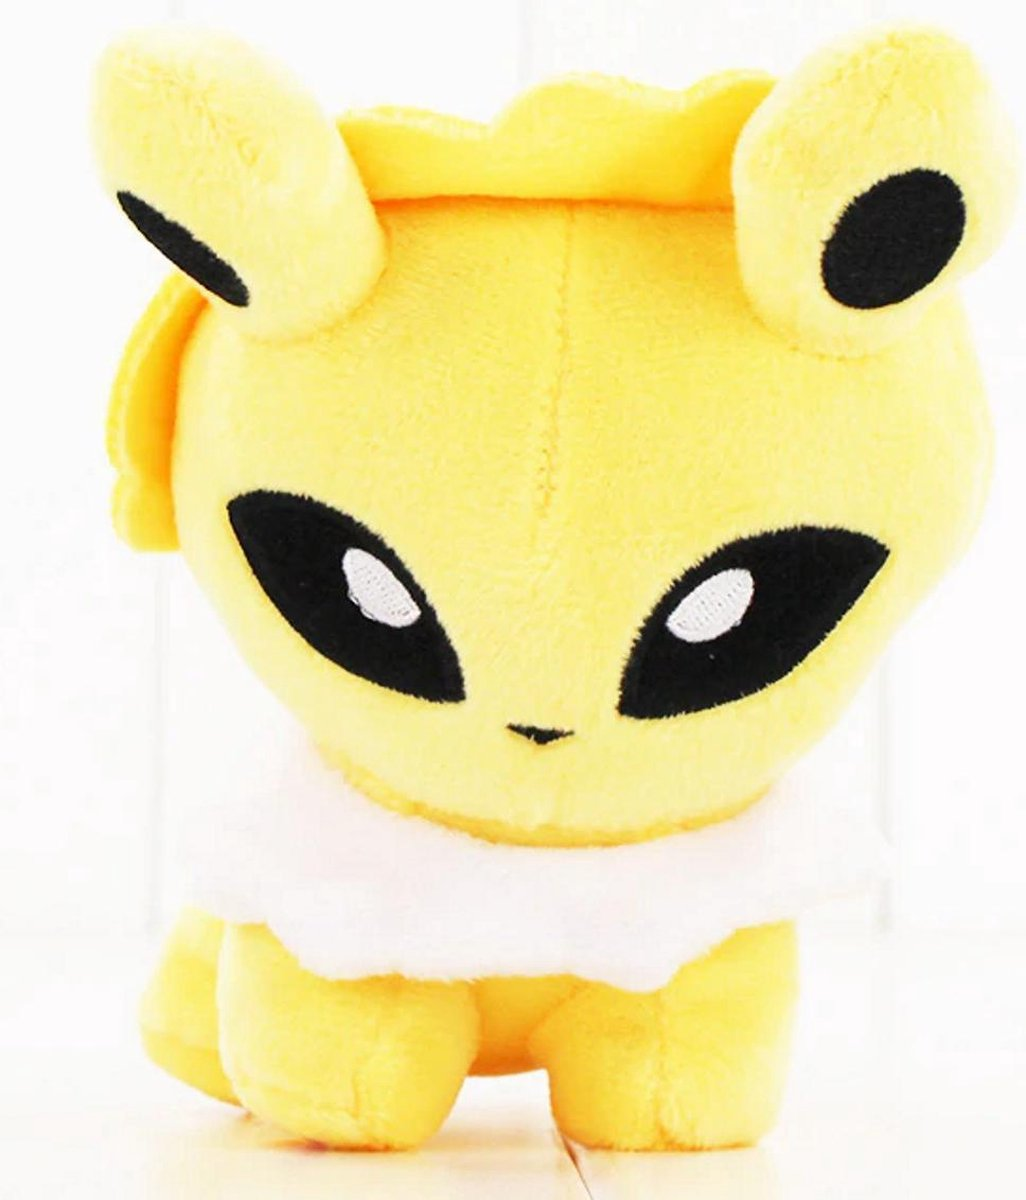 Knuffel Pokemon Jolteon - bekend van de TV - creator - Pokémon - pokéball - speelgoed - Plushe